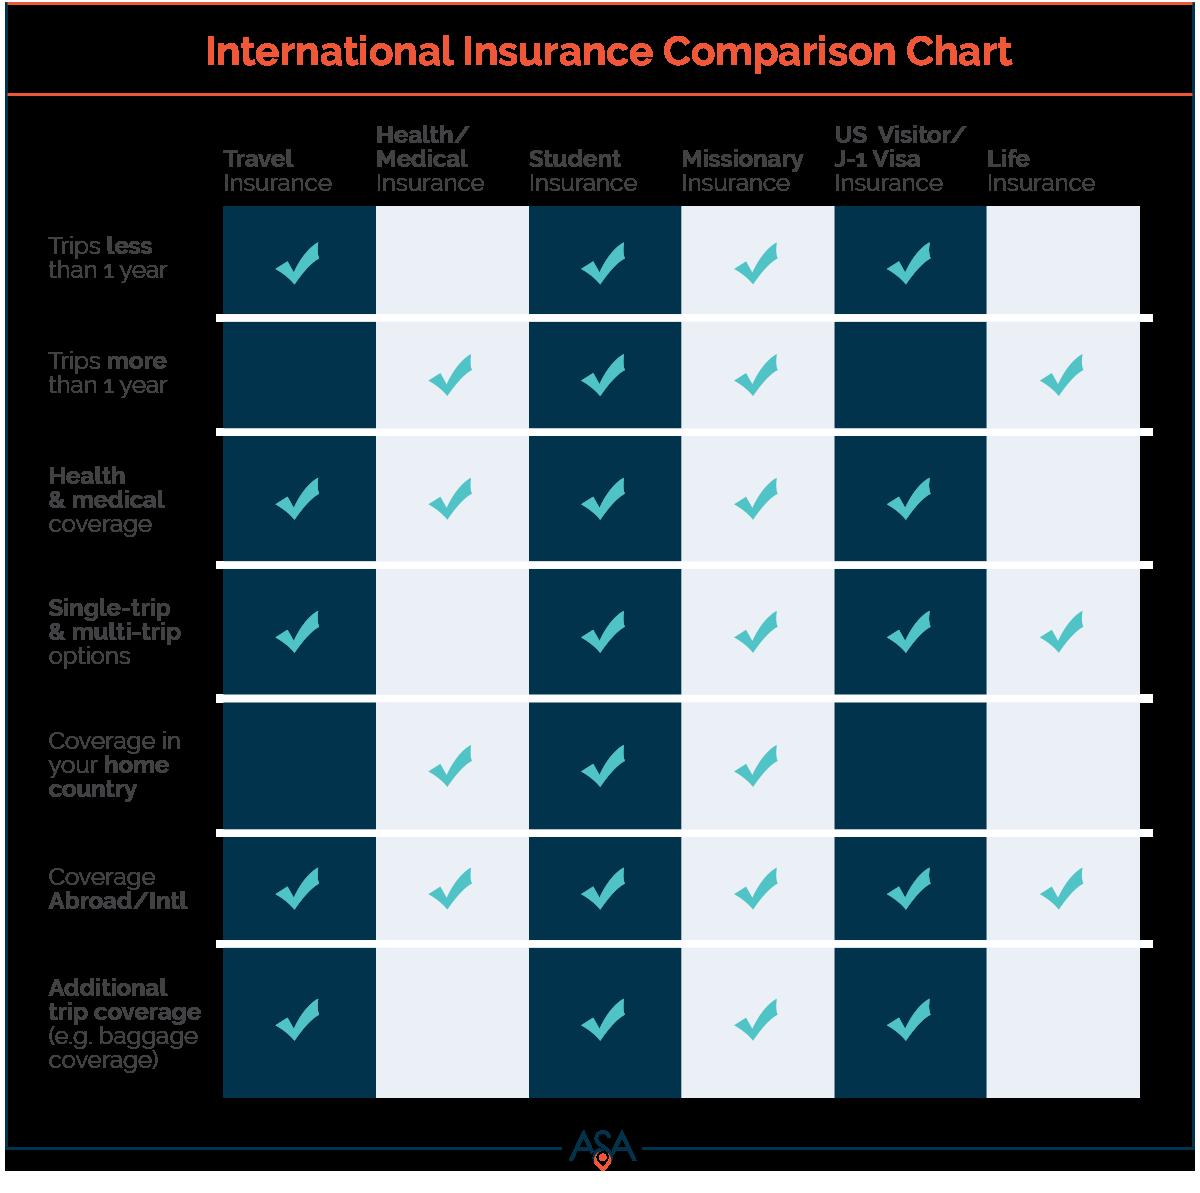 International Insurance Comparison Chart Jan 23 2018